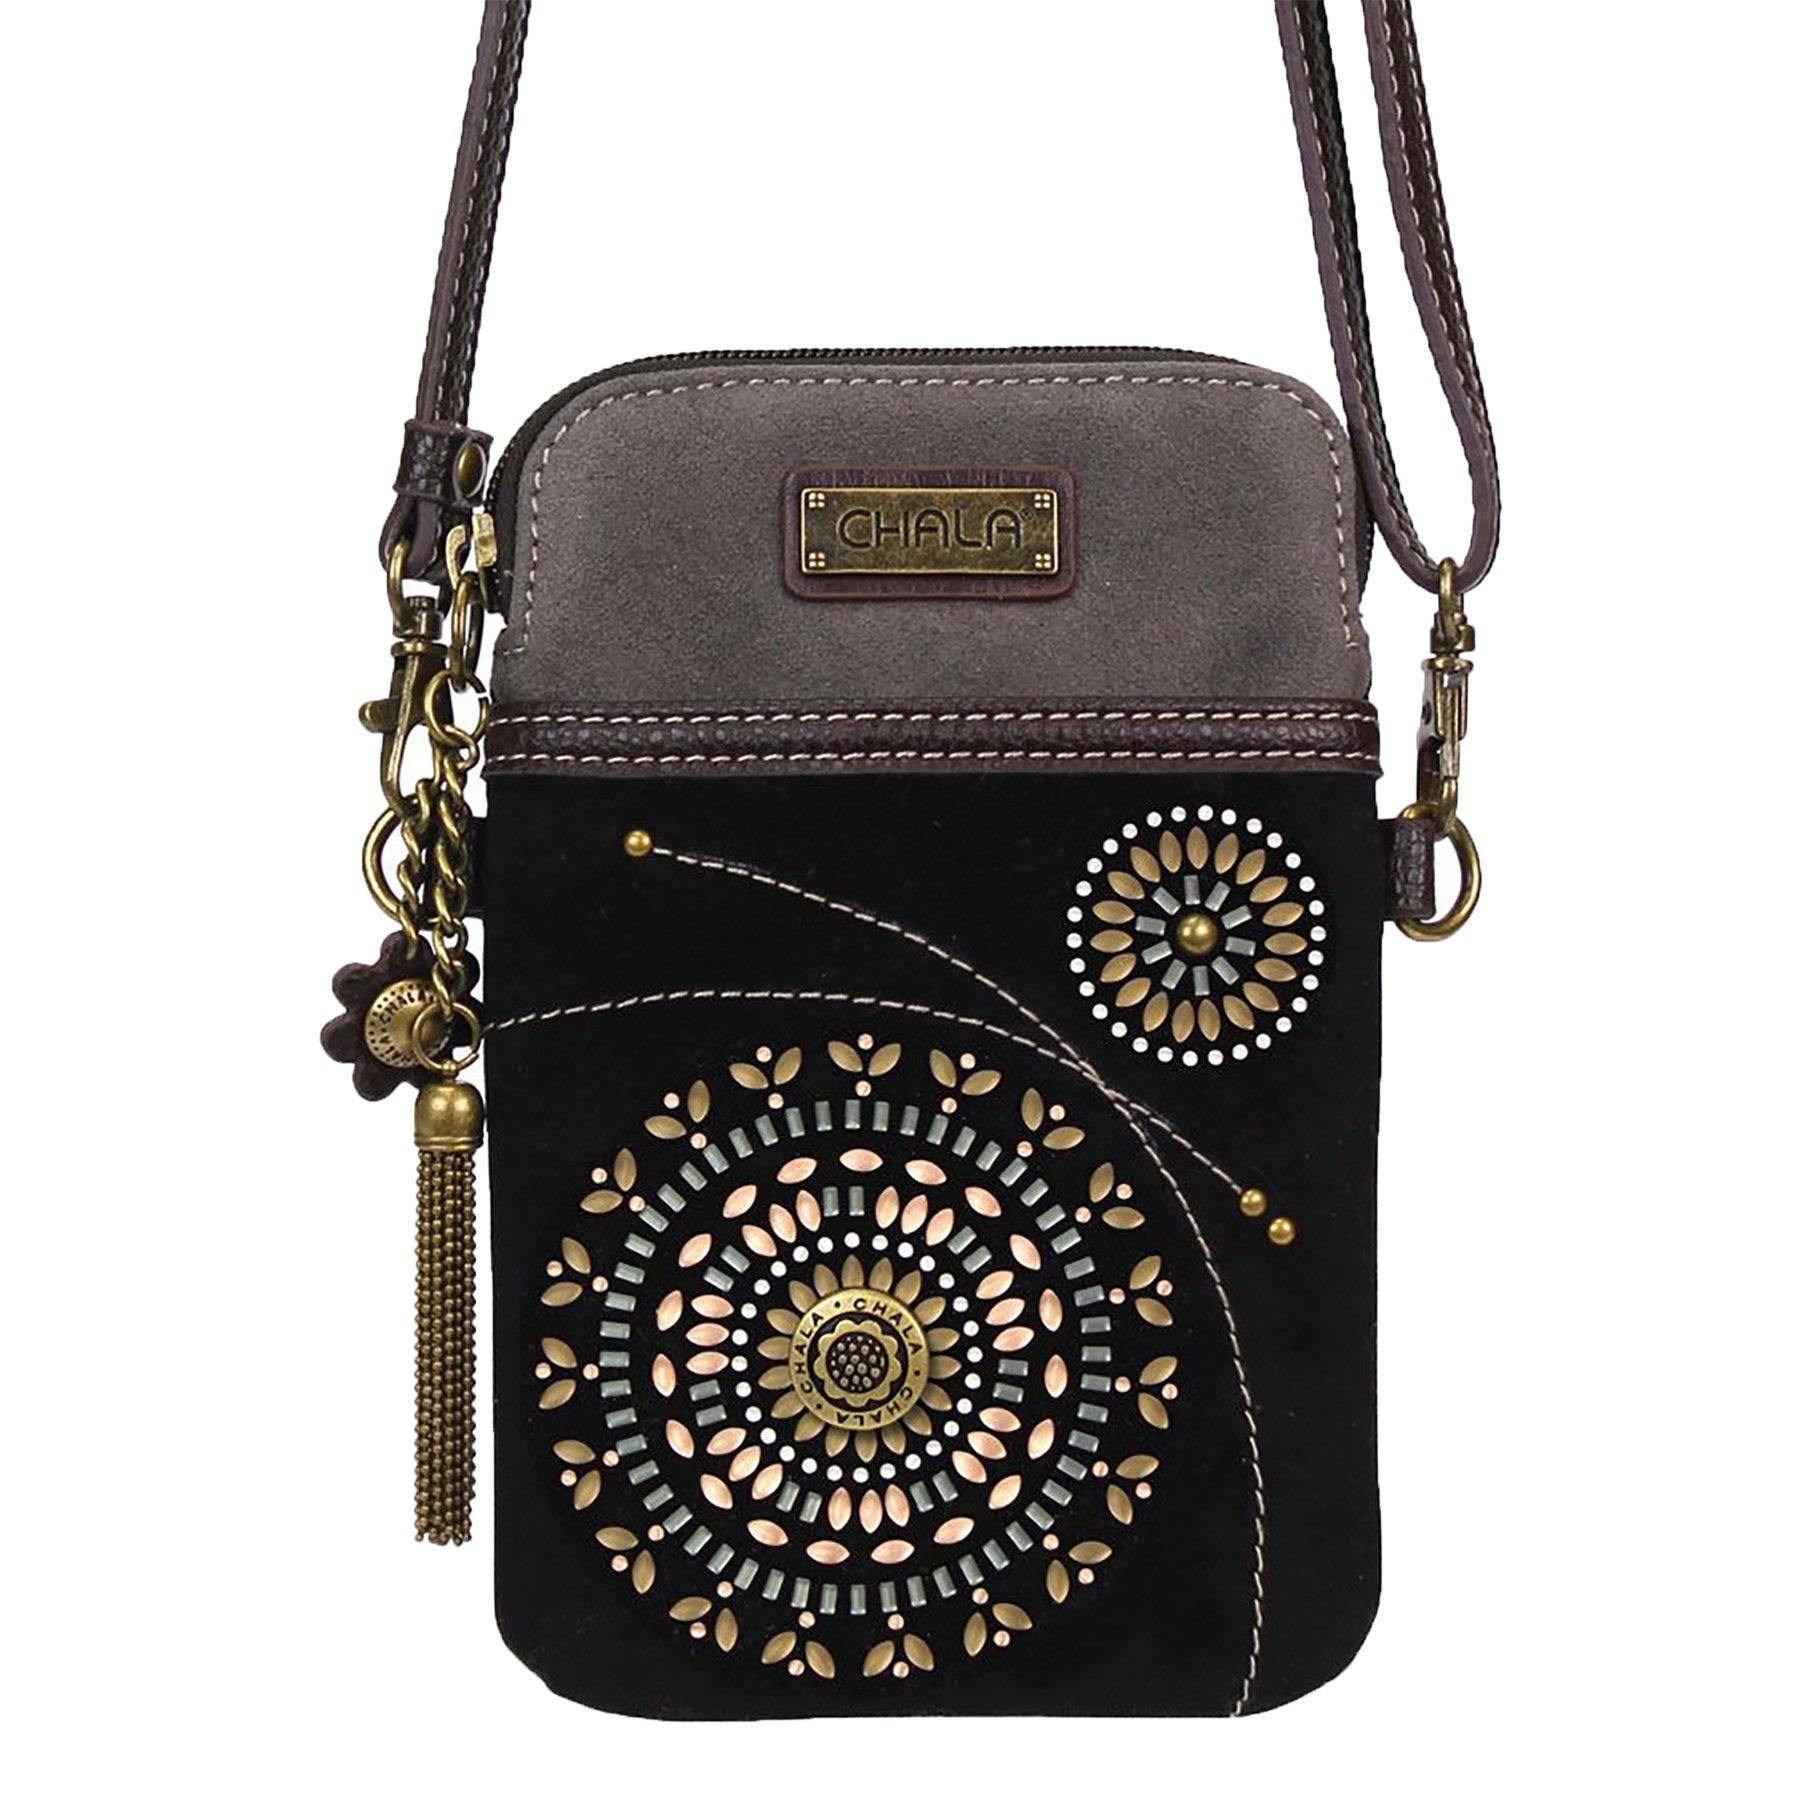 Chala Crossbody Cell Phone Purse - Women Faux Suede Multicolor Handbag with Adjustable Strap - Starburst - Black